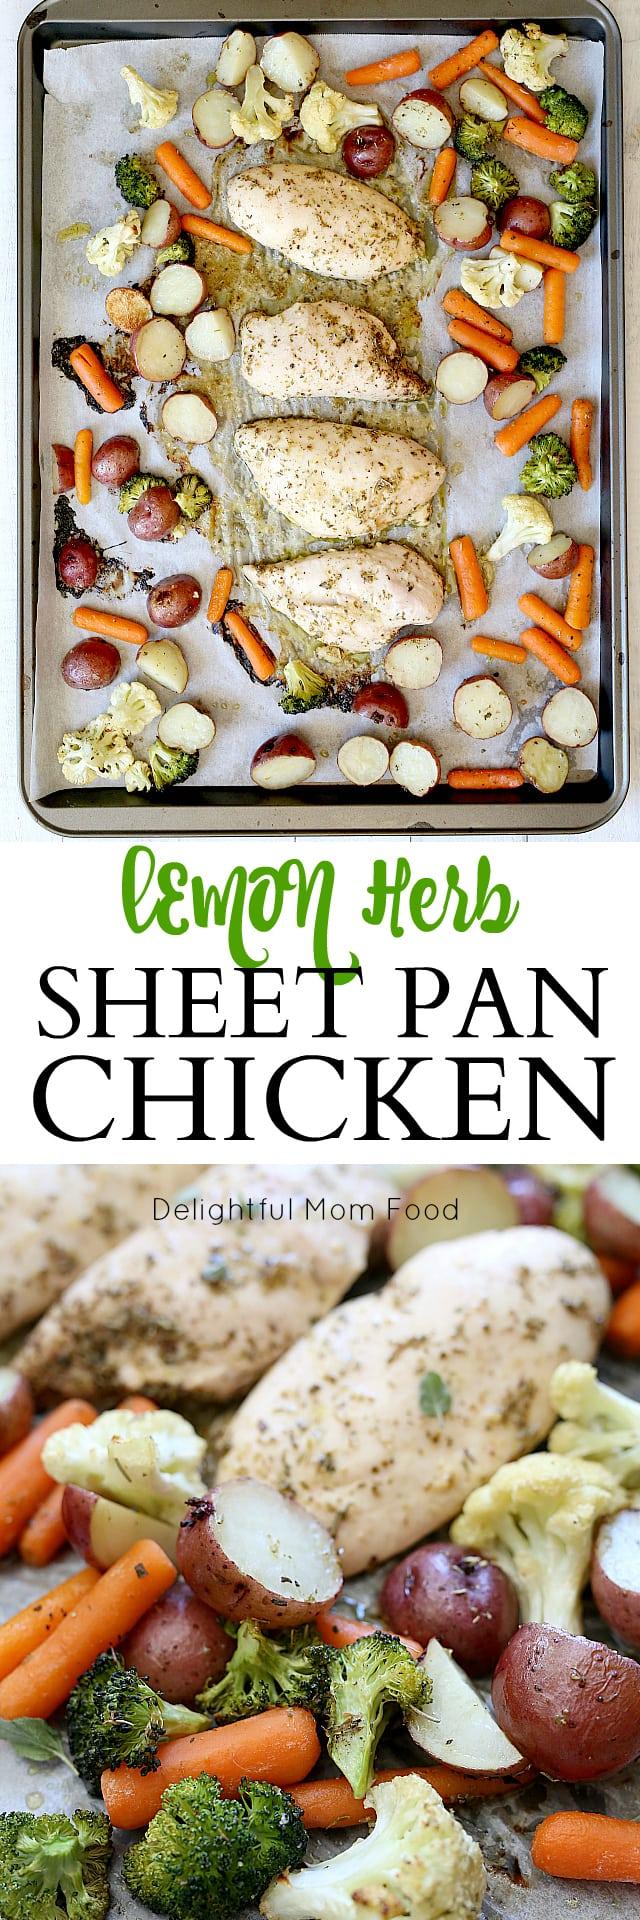 30 Minute Sheet Pan Dinners! Lemony Herb Sheet Pan Chicken, Broccoli, Carrots, Cauliflower, and Red Potatoes